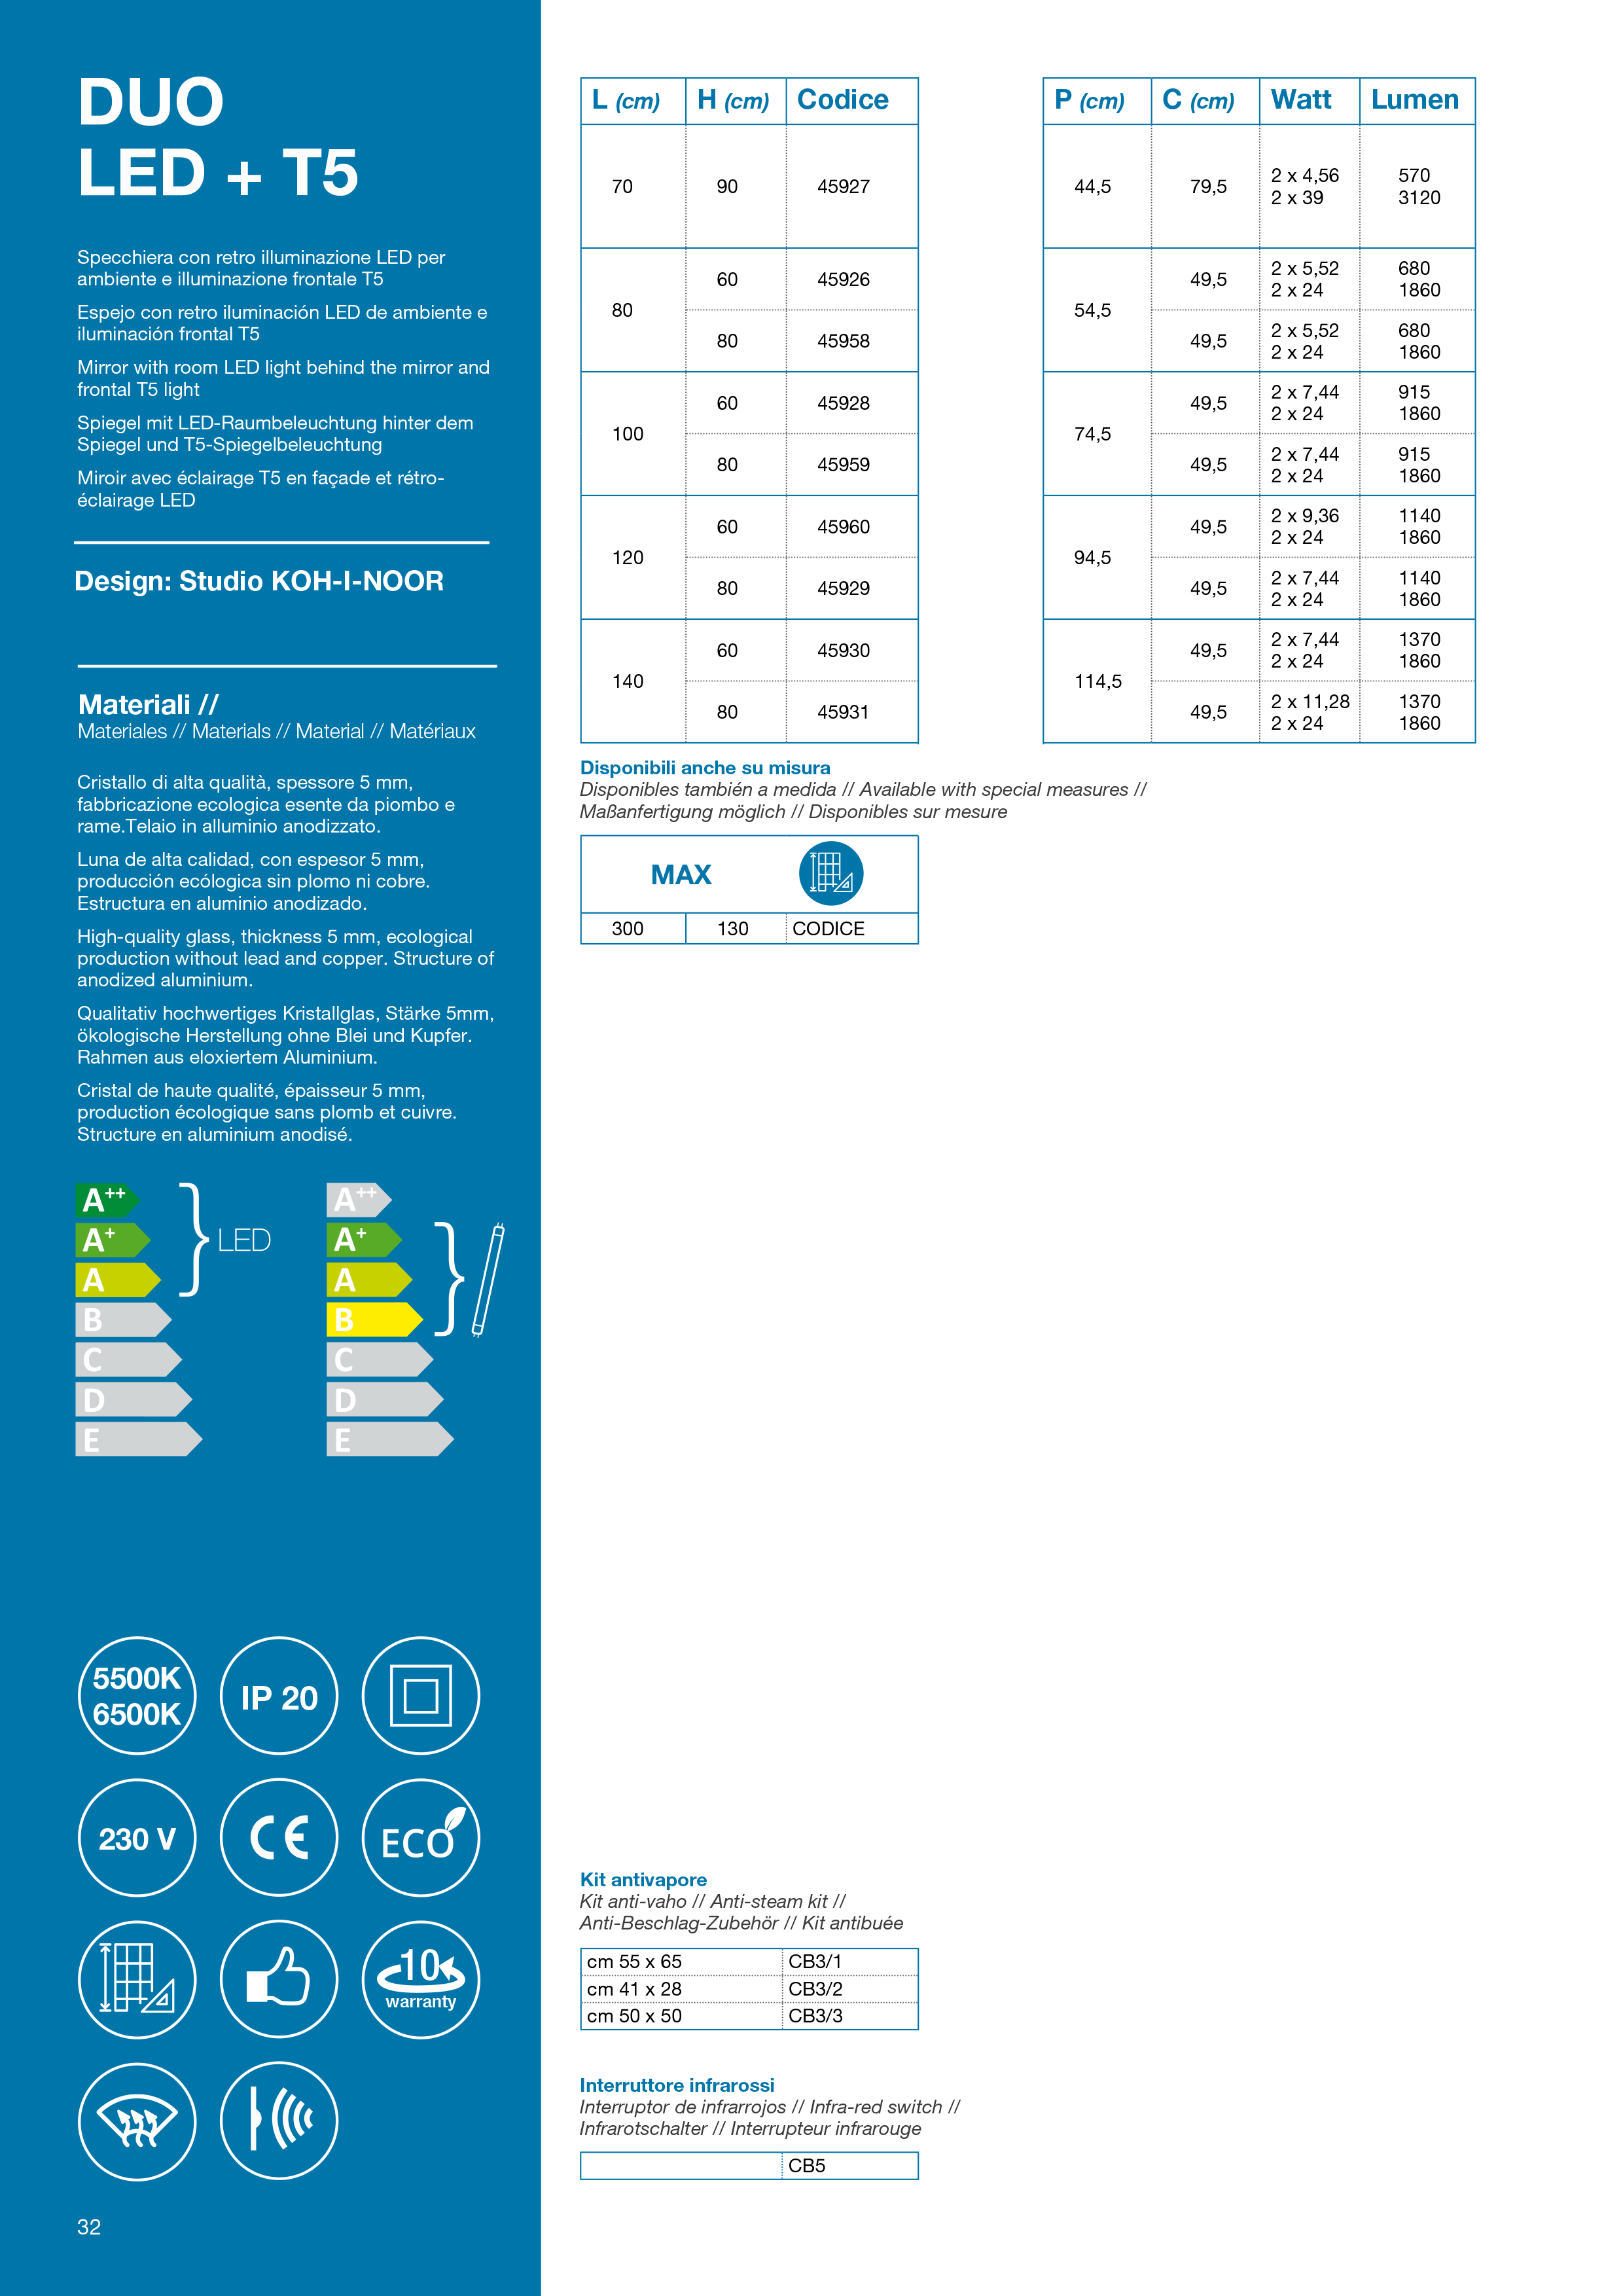 tabella-duo-led-t5